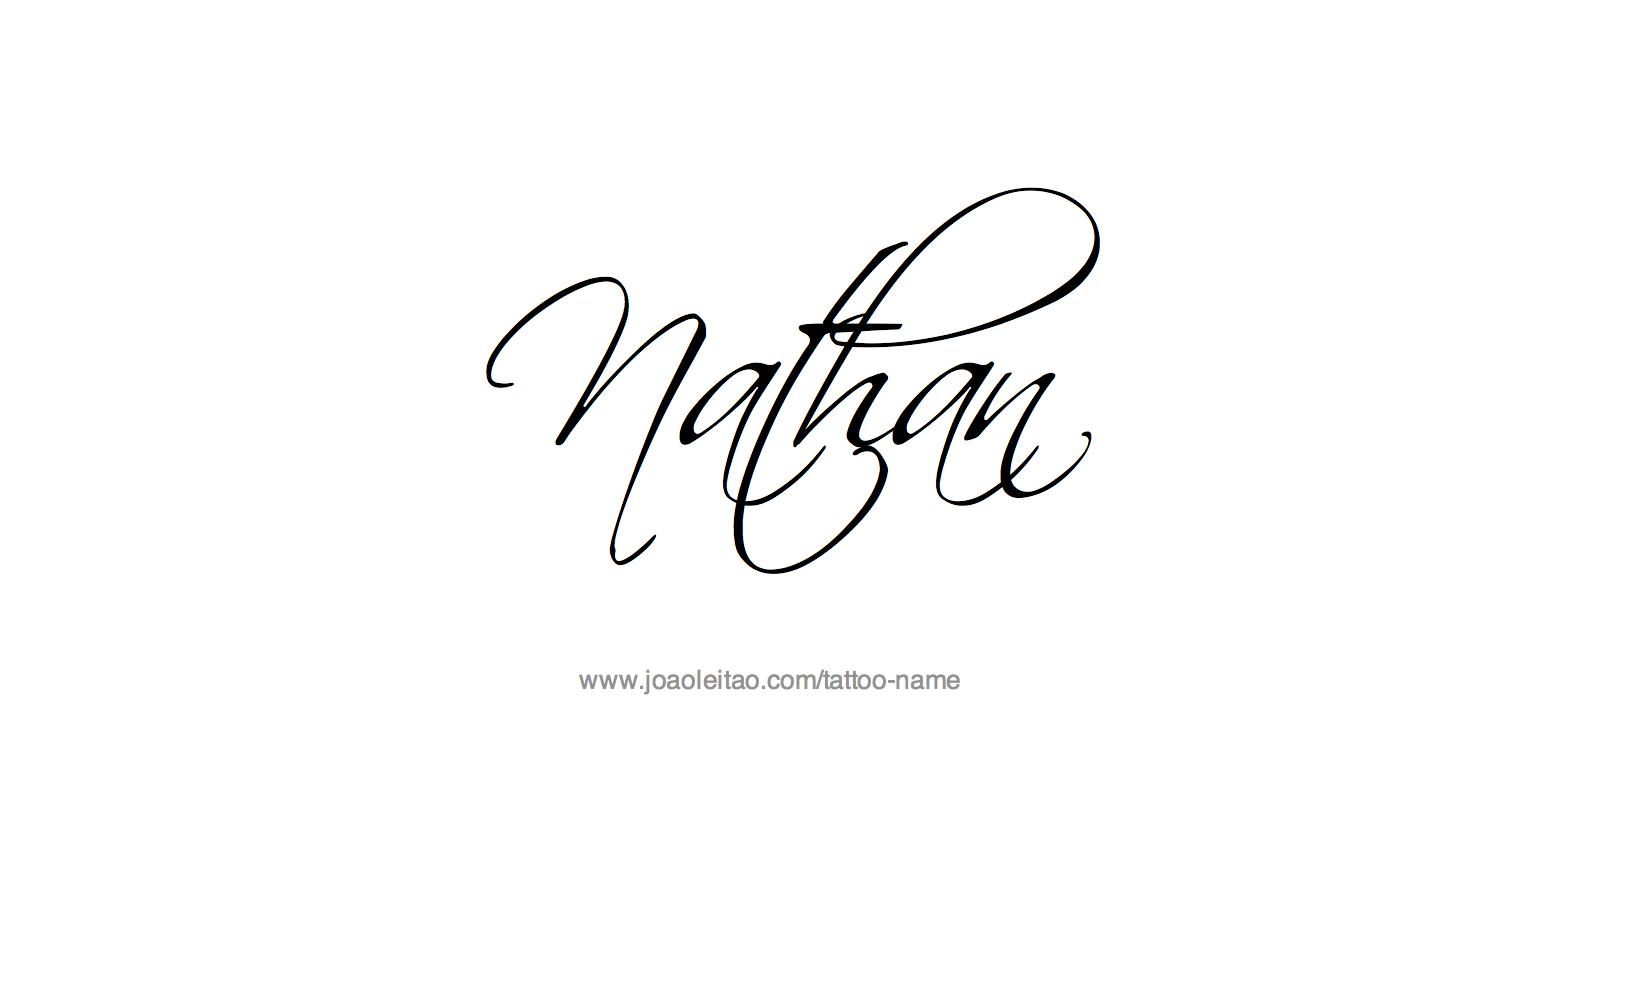 Tattoo name writing designs nathan name tattoo designs  my style  pinterest  tattoos tattoo